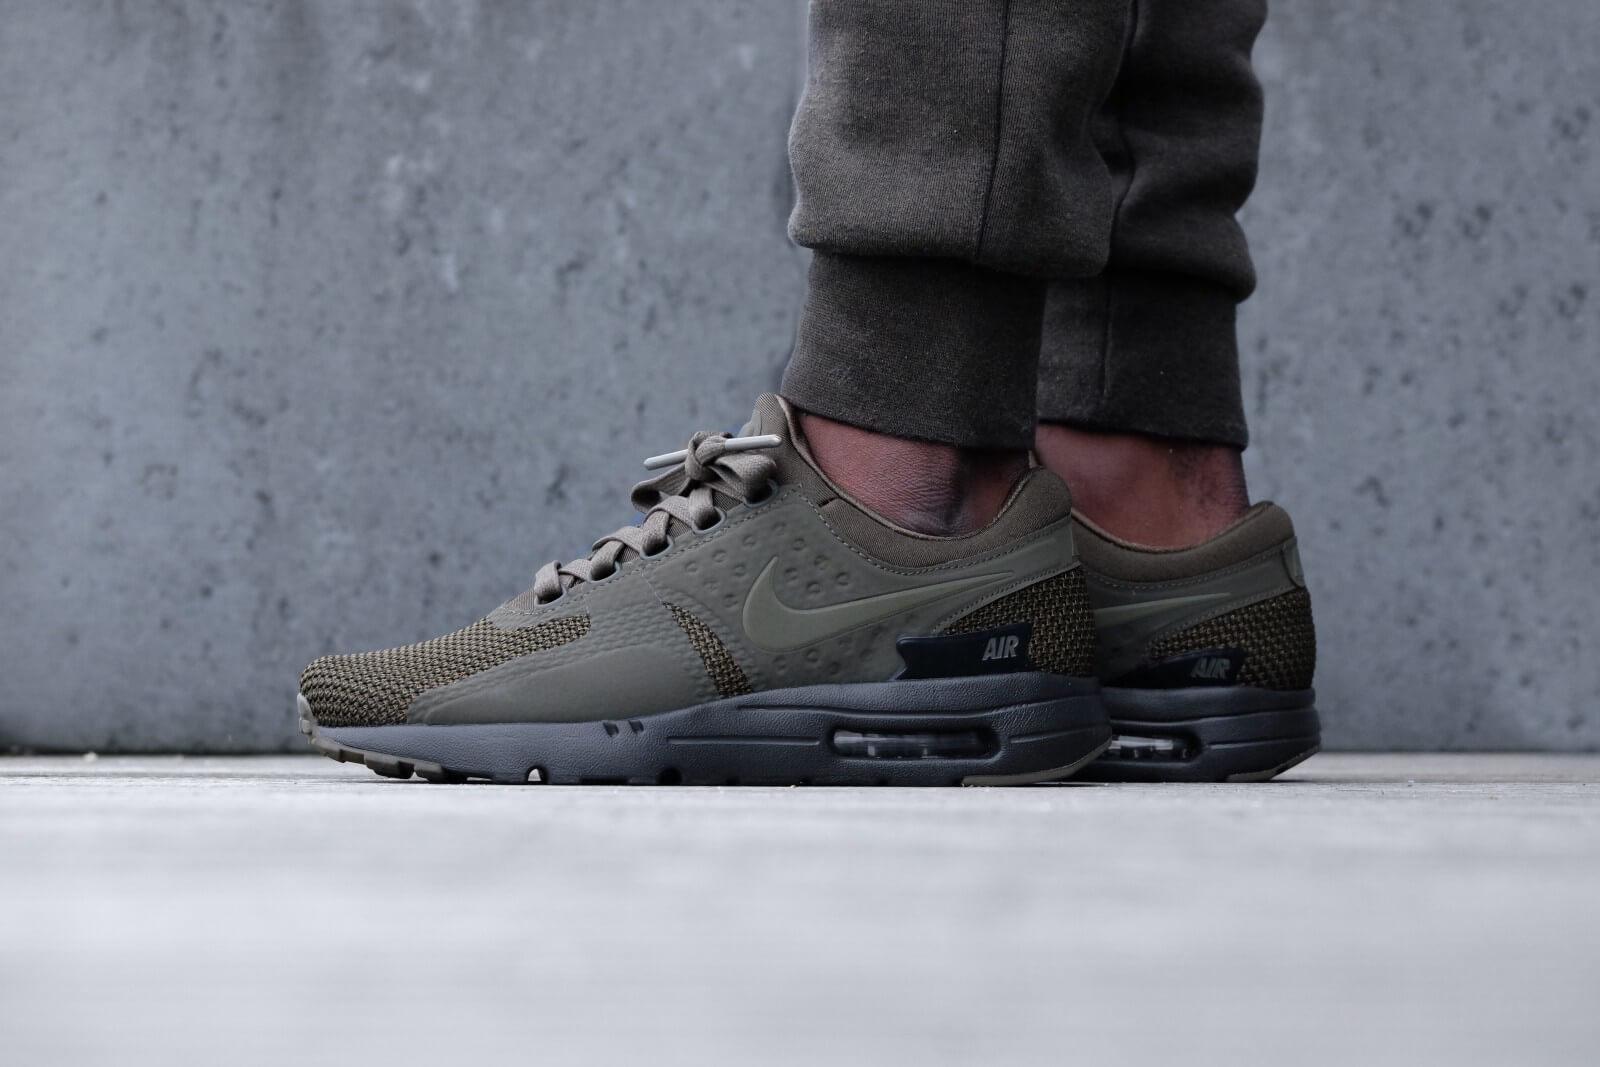 Nike Air Max Zero Premium Dark Loden   SneakerFiles